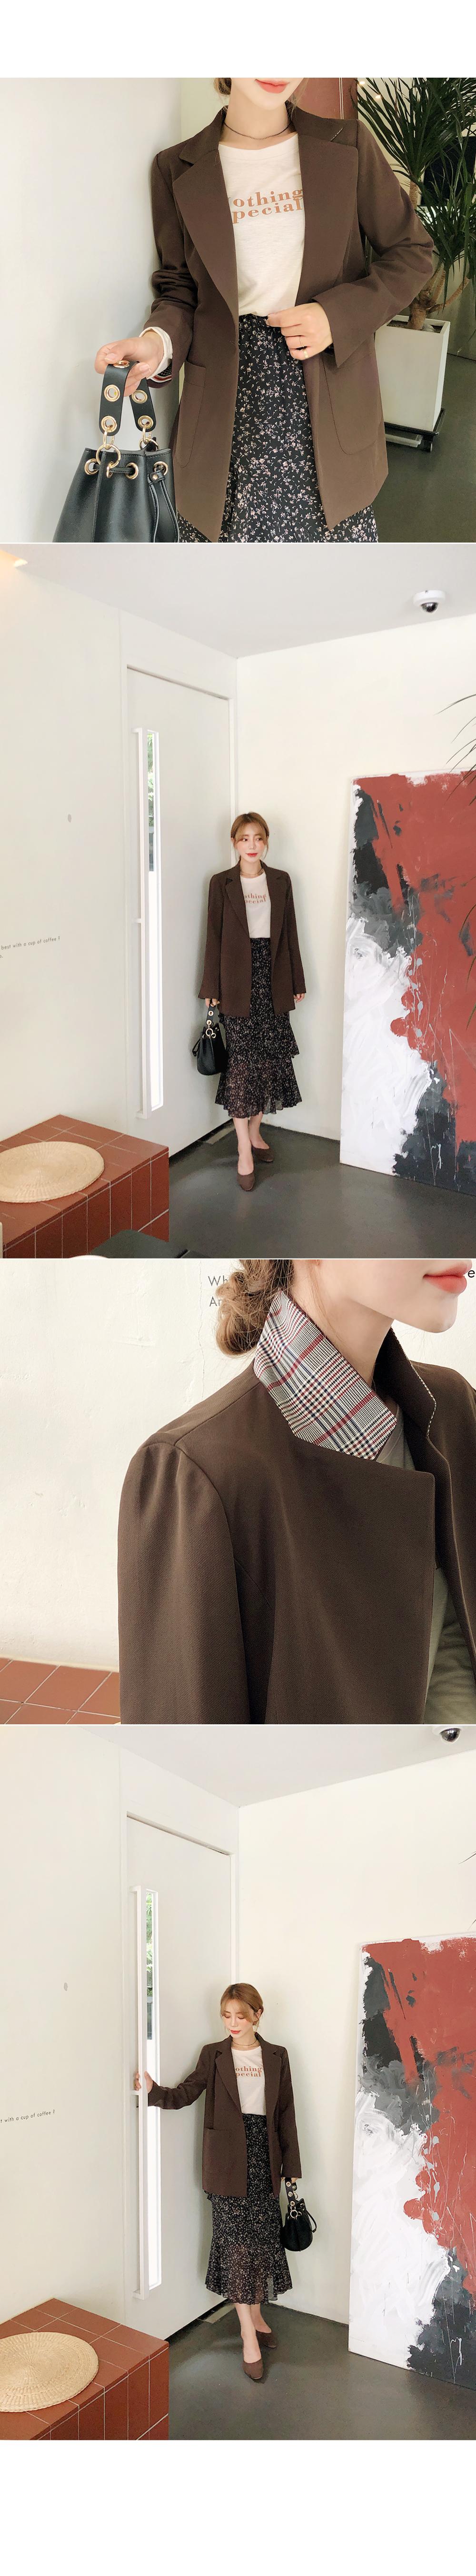 Diagonal canvas chiffon skirt